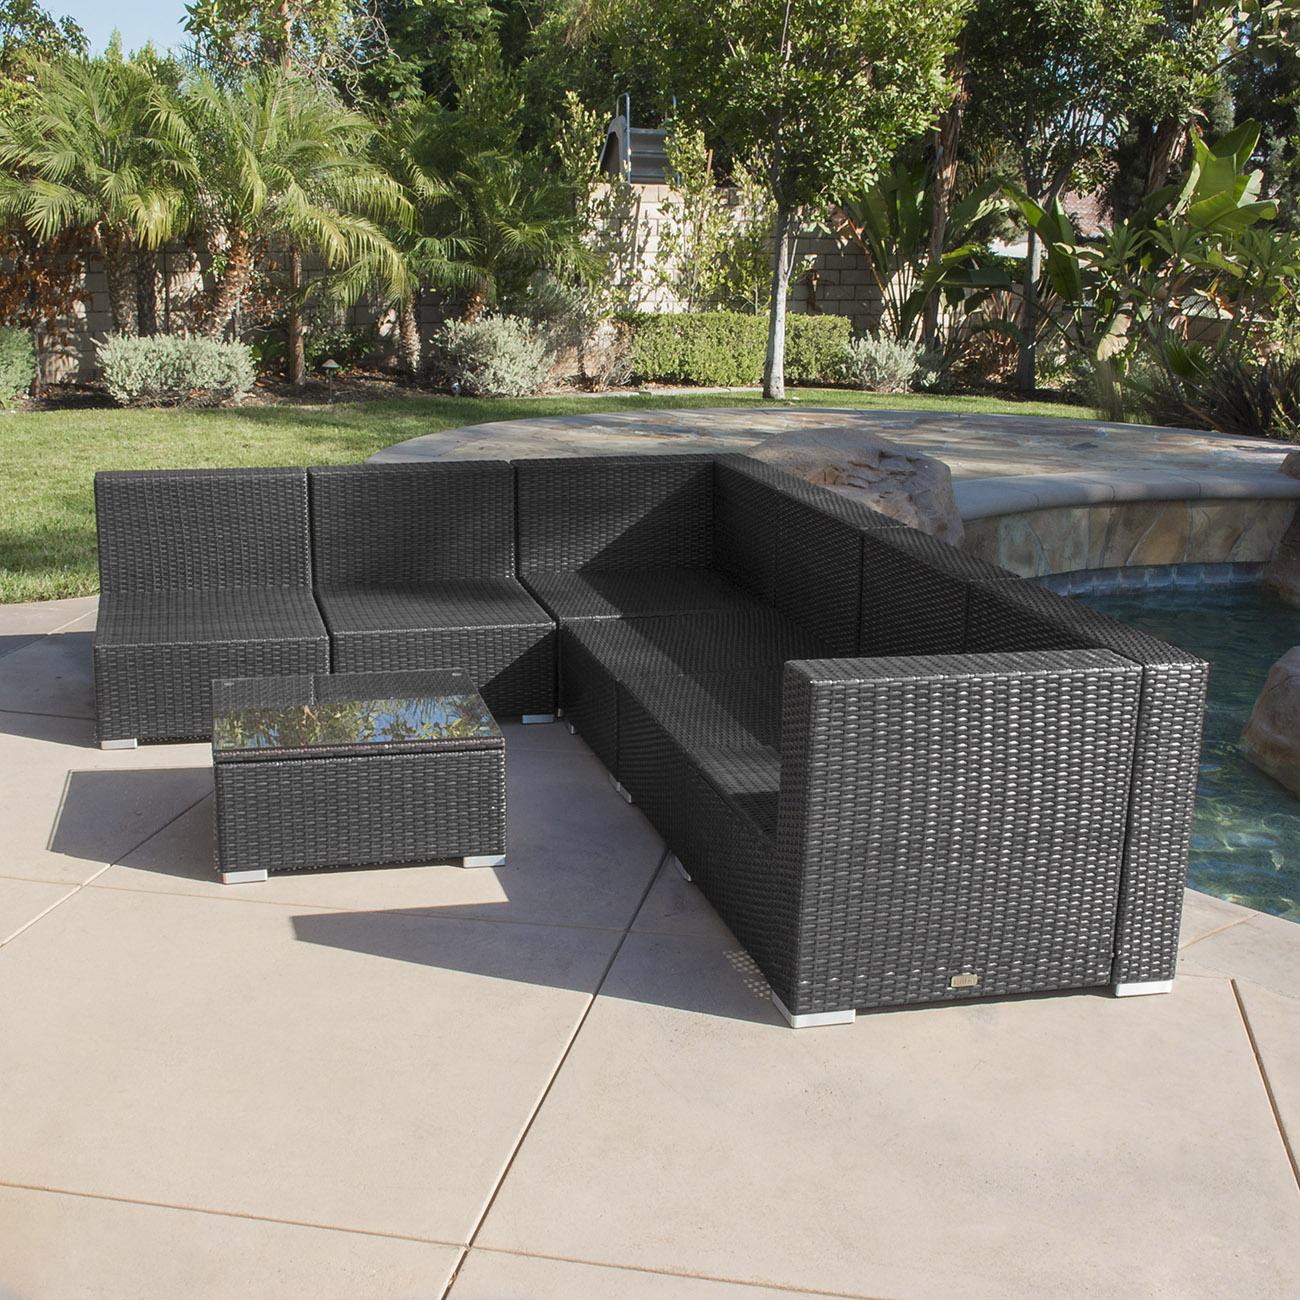 outdoor wicker sofa cushions boston red sox detroit tigers sofascore 7pc patio rattan furniture aluminum